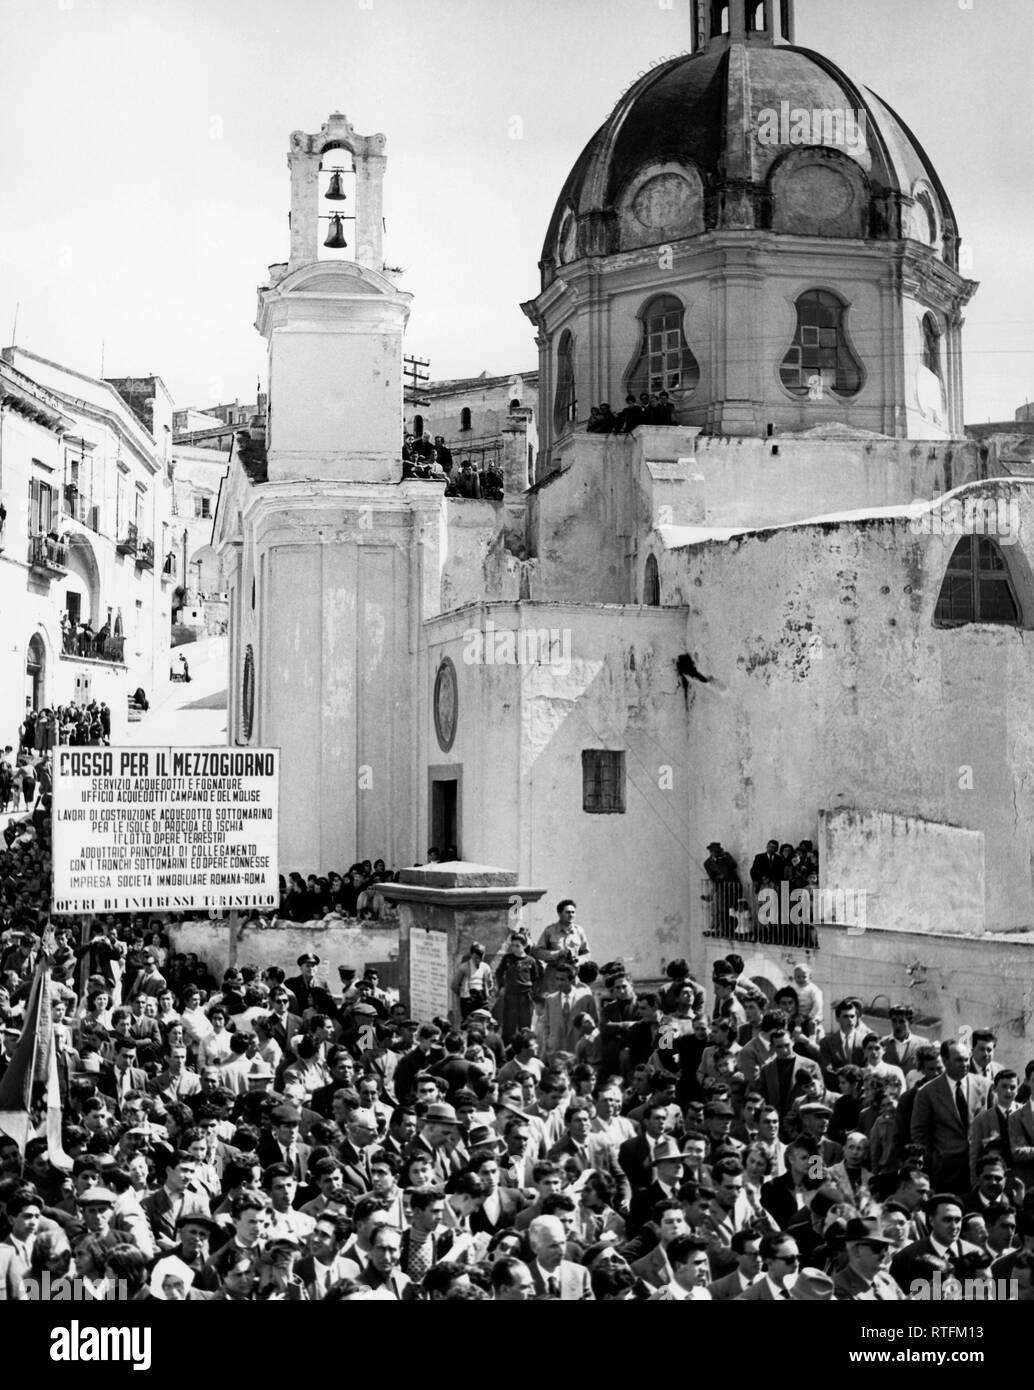 Imprese Di Costruzioni Roma crowd, aqueduct submarine to procida and ischia, italy 1960